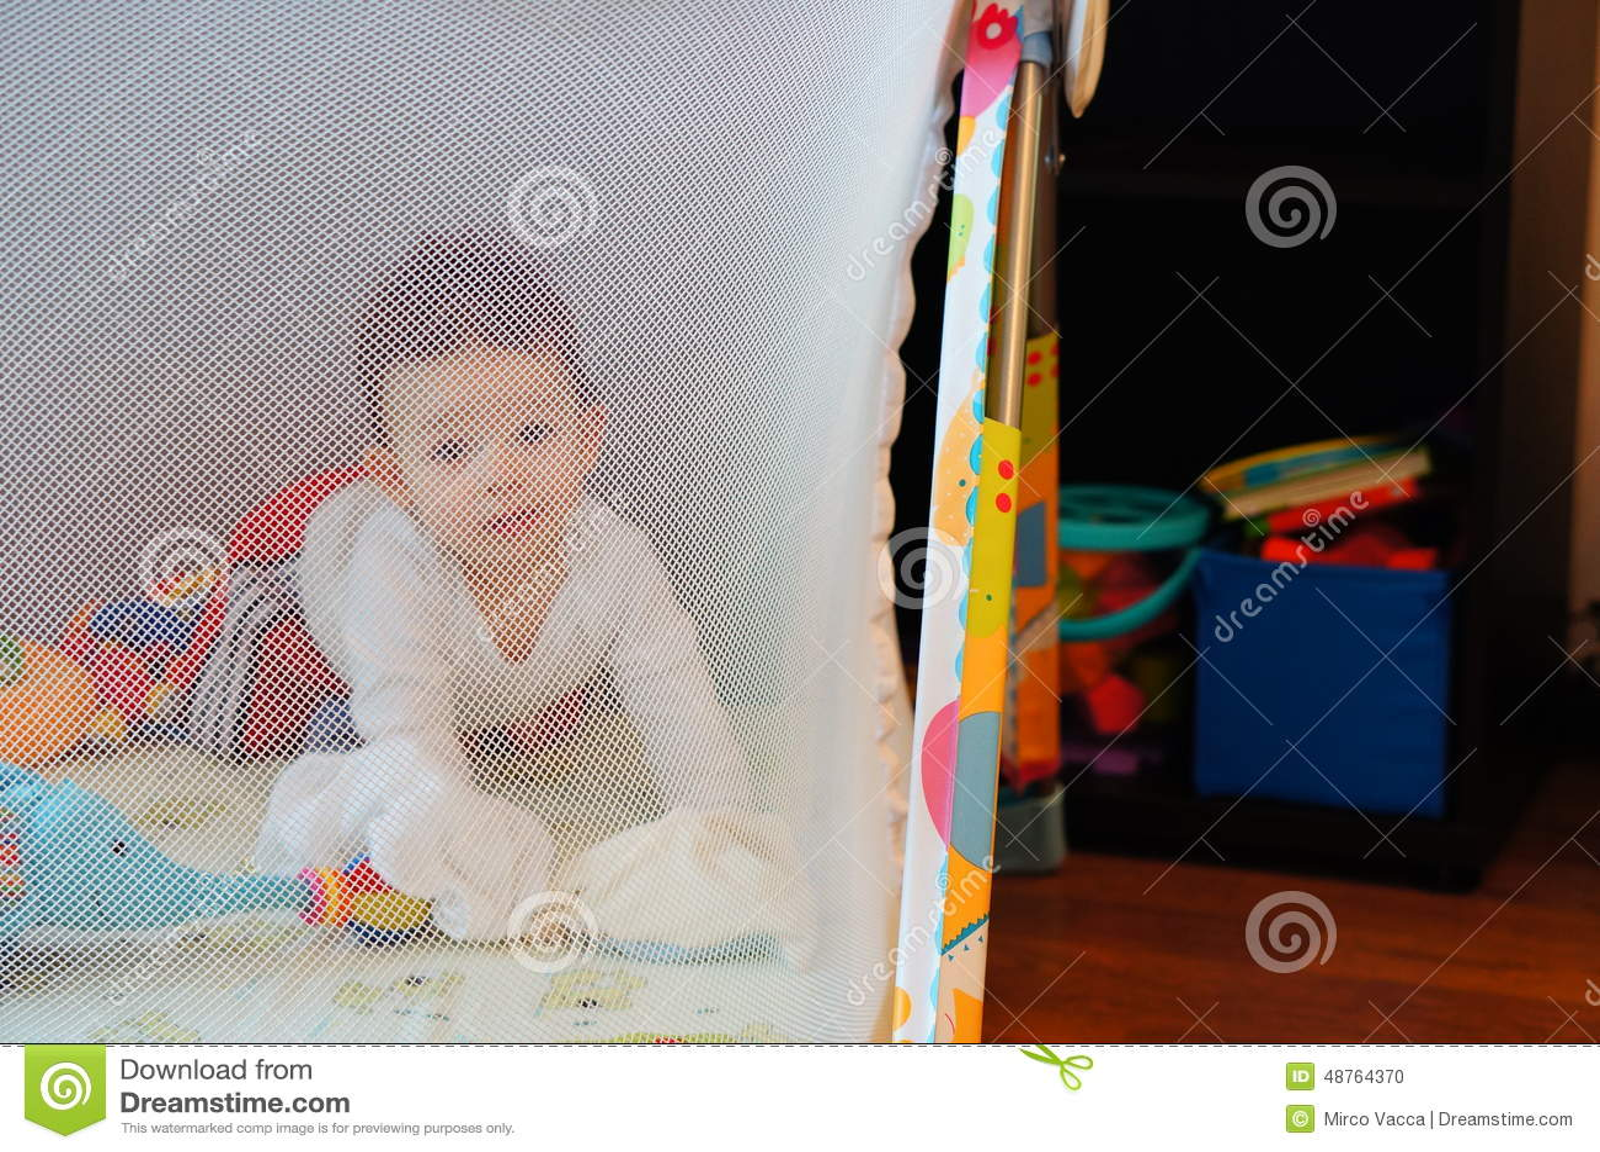 Dziecko kojec